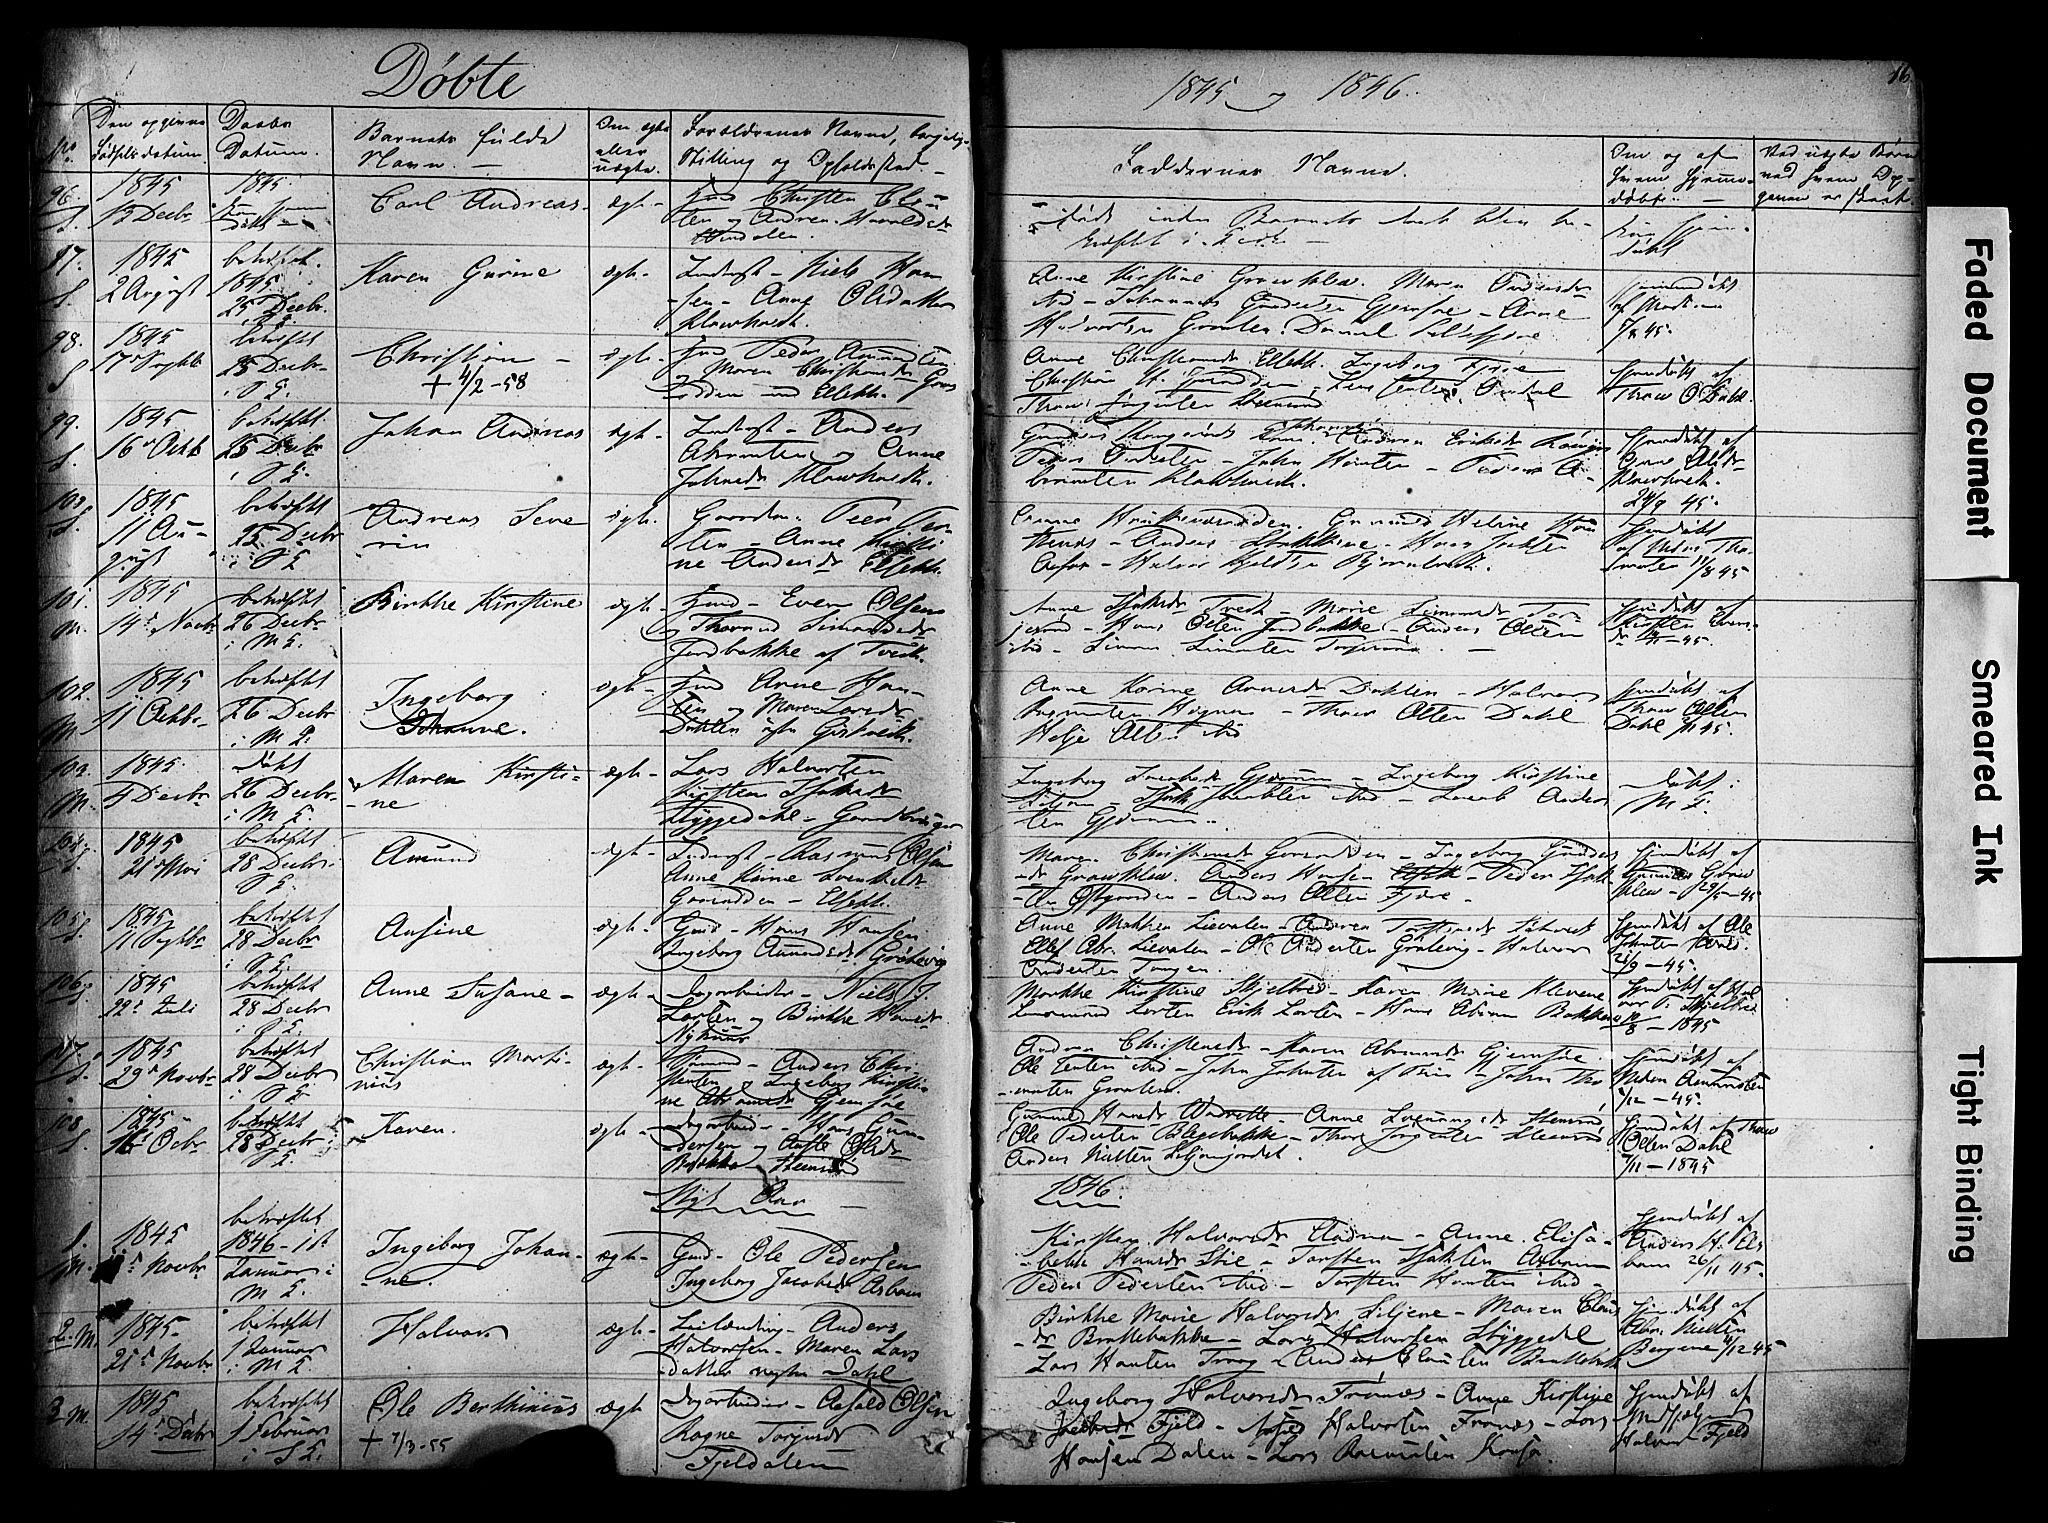 SAKO, Solum kirkebøker, F/Fa/L0006: Ministerialbok nr. I 6, 1844-1855, s. 16